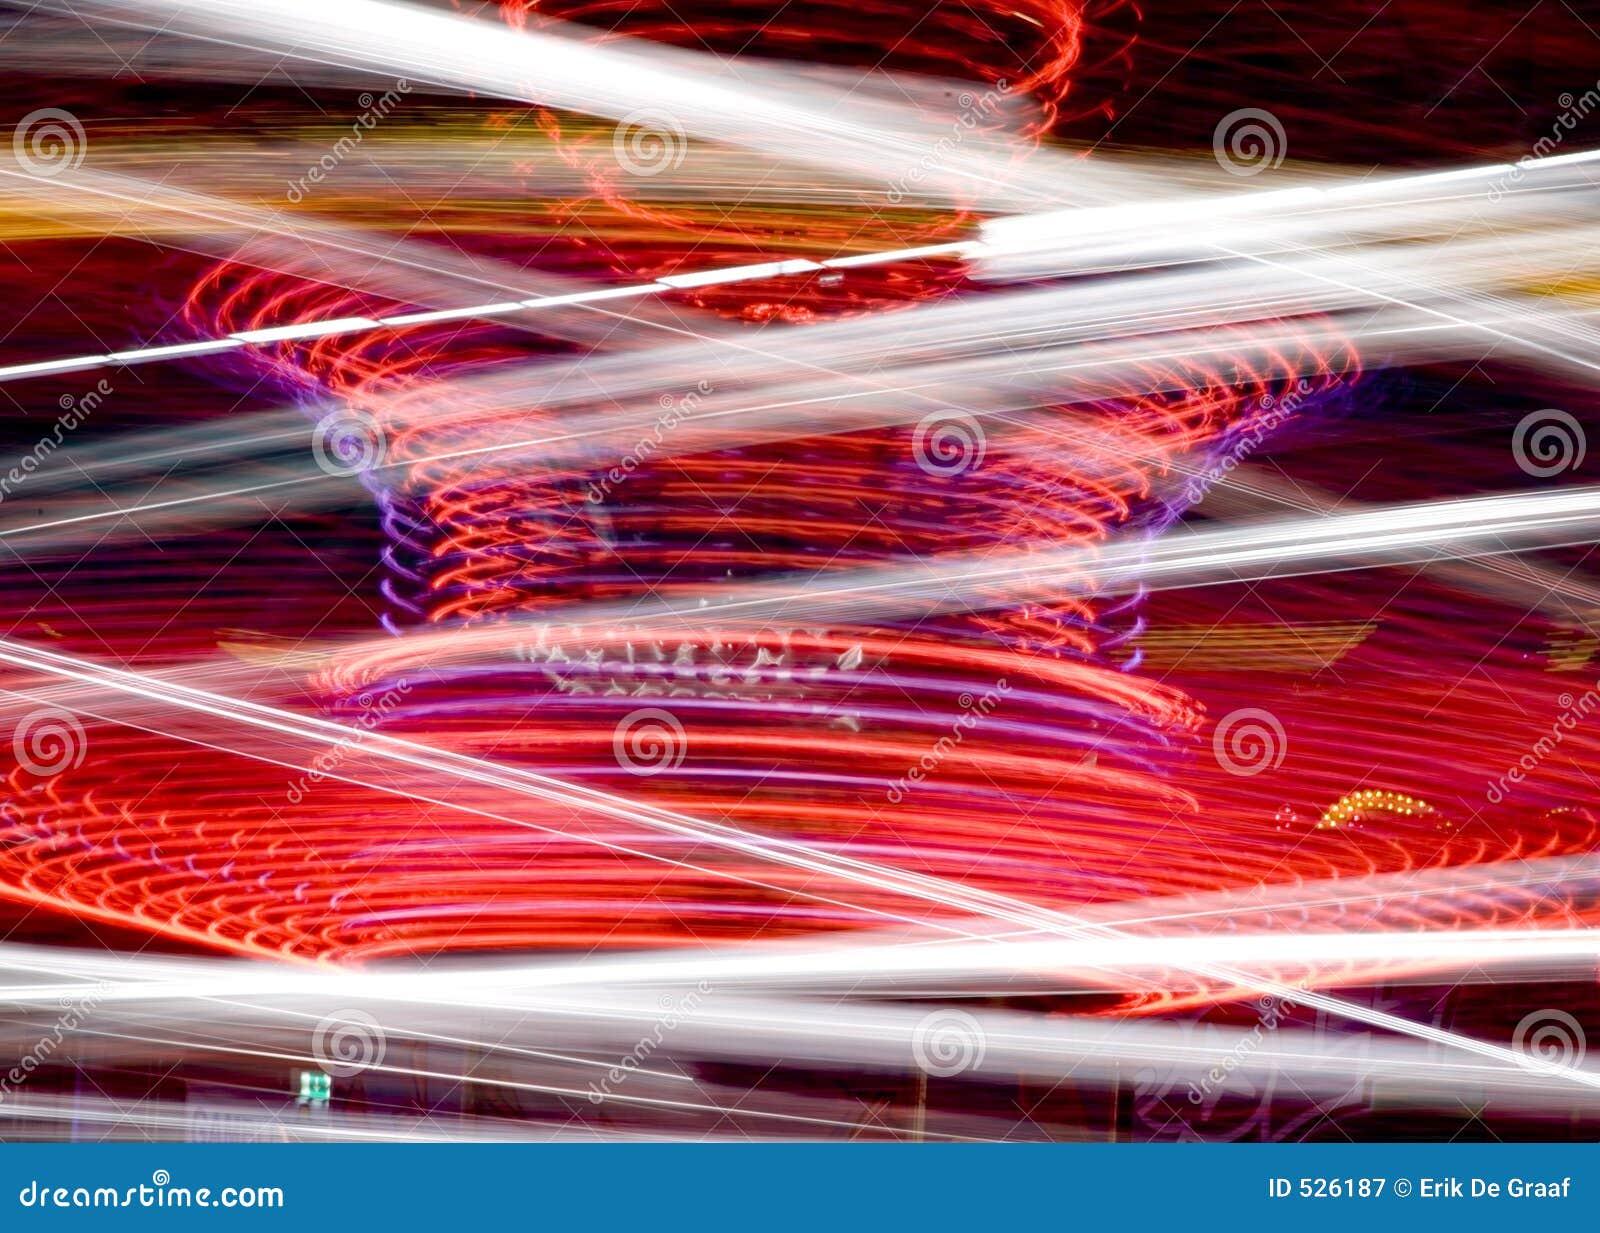 Download 2游乐园 库存图片. 图片 包括有 招待, 娱乐, 孩子, 圈子, 局部, 公园, 行动, 乐趣, 乘驾, 路辗 - 526187